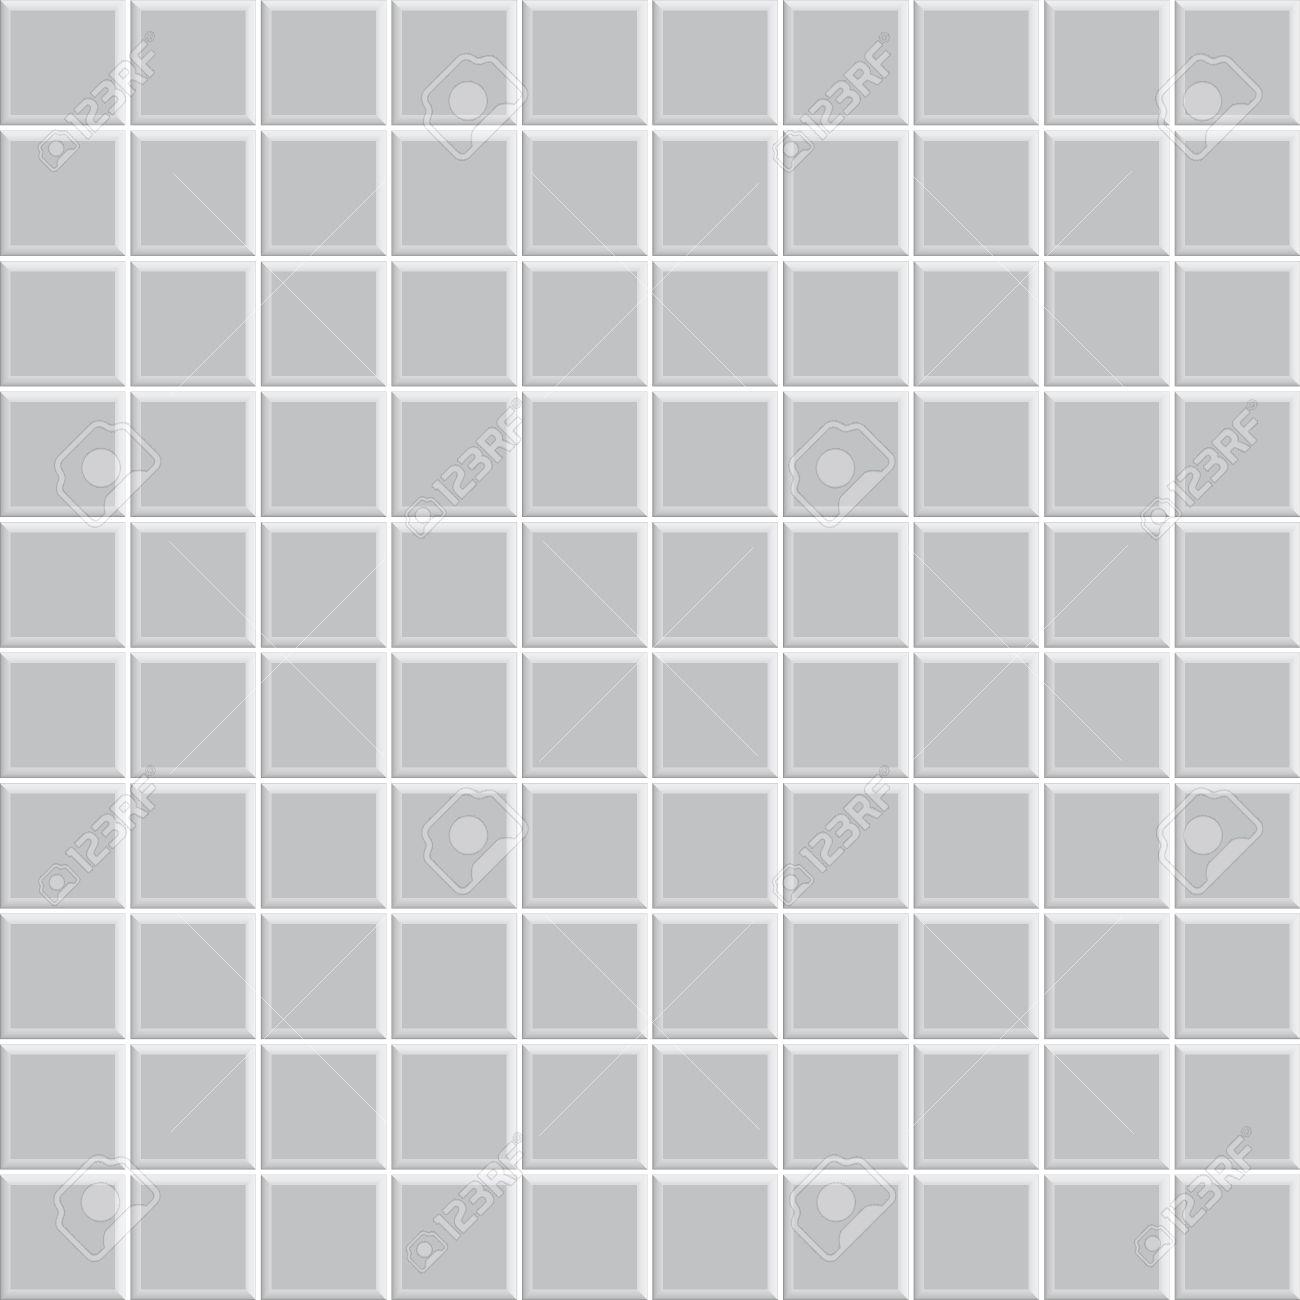 Fliesen textur grau  Graue Quadrat Fliesen Textur Der Wand Und Boden, Fliesen Innenraum ...